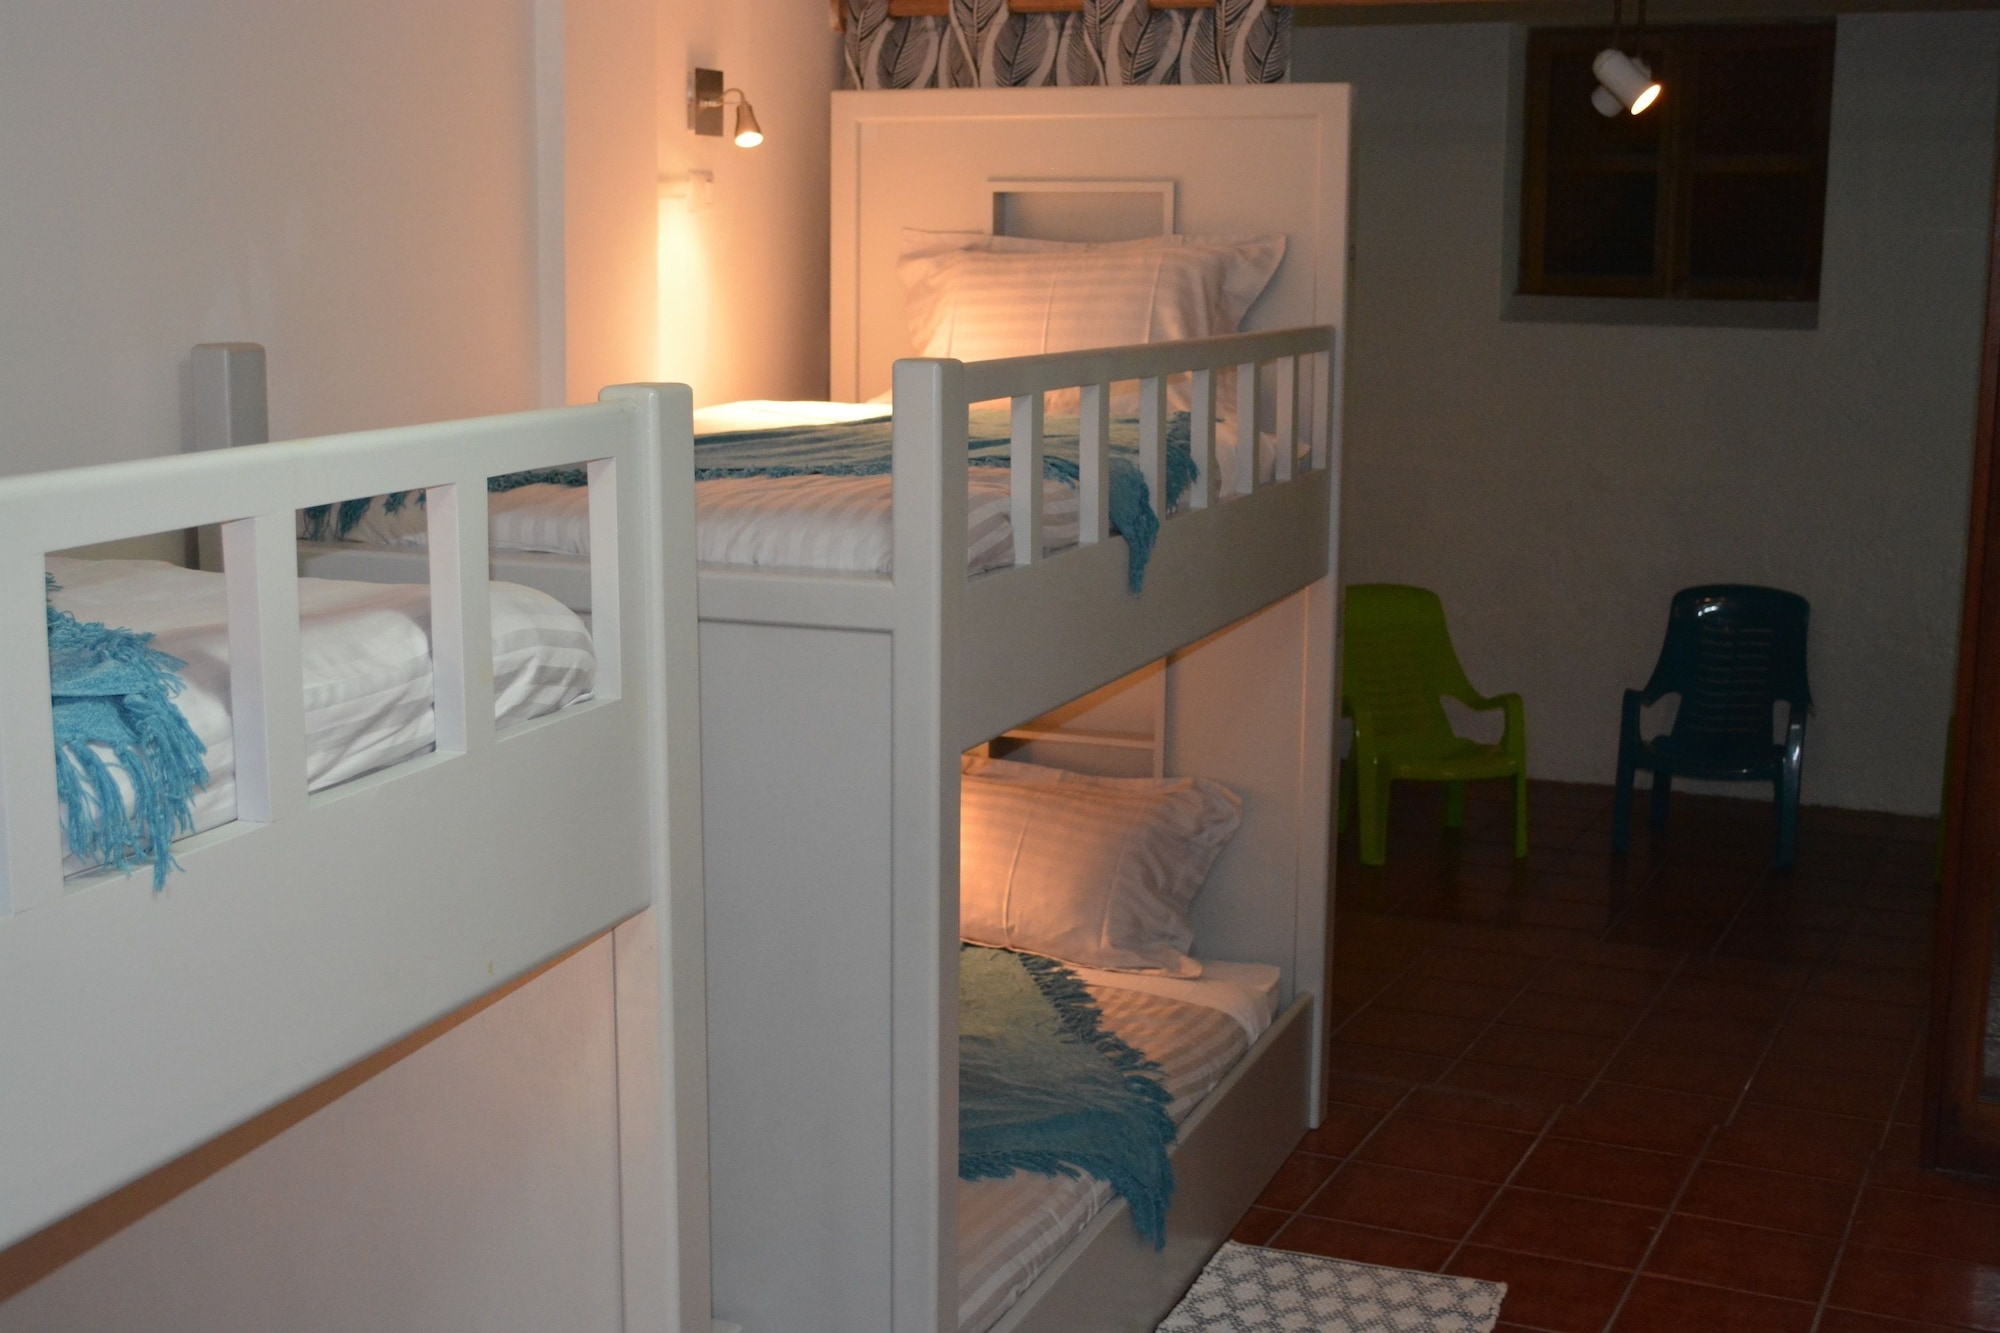 Luna Maya Hostel & Wellness, Antigua Guatemala